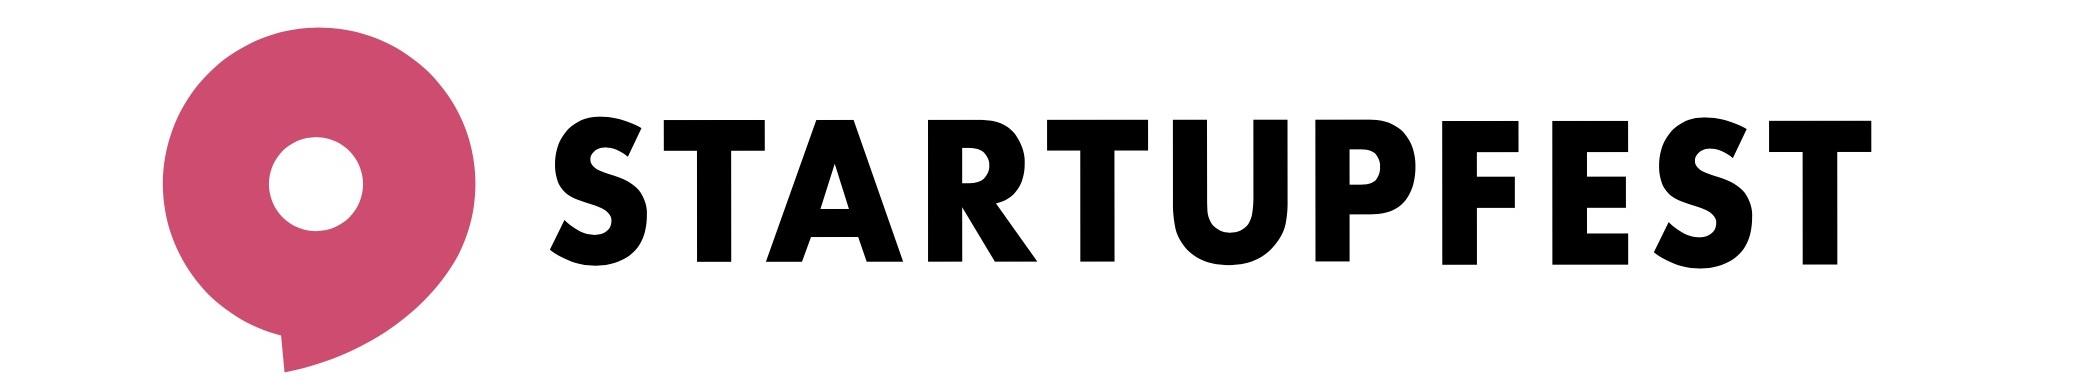 Startupfest-logo-Horizontal-Black-text.jpg